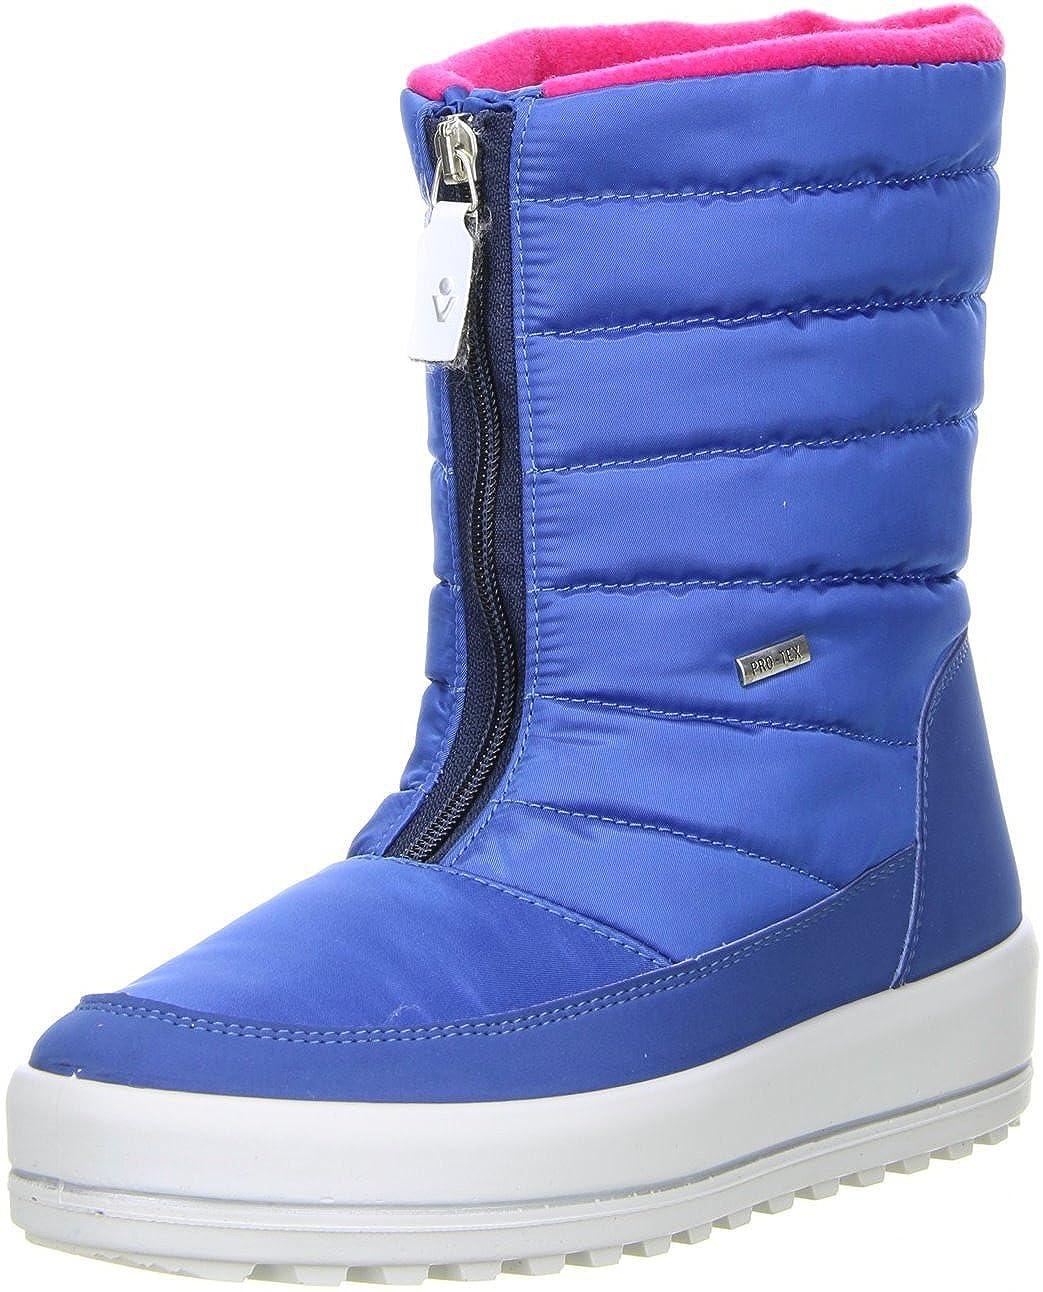 Vista Damen Winterstiefel SnowStiefel Blau Blau